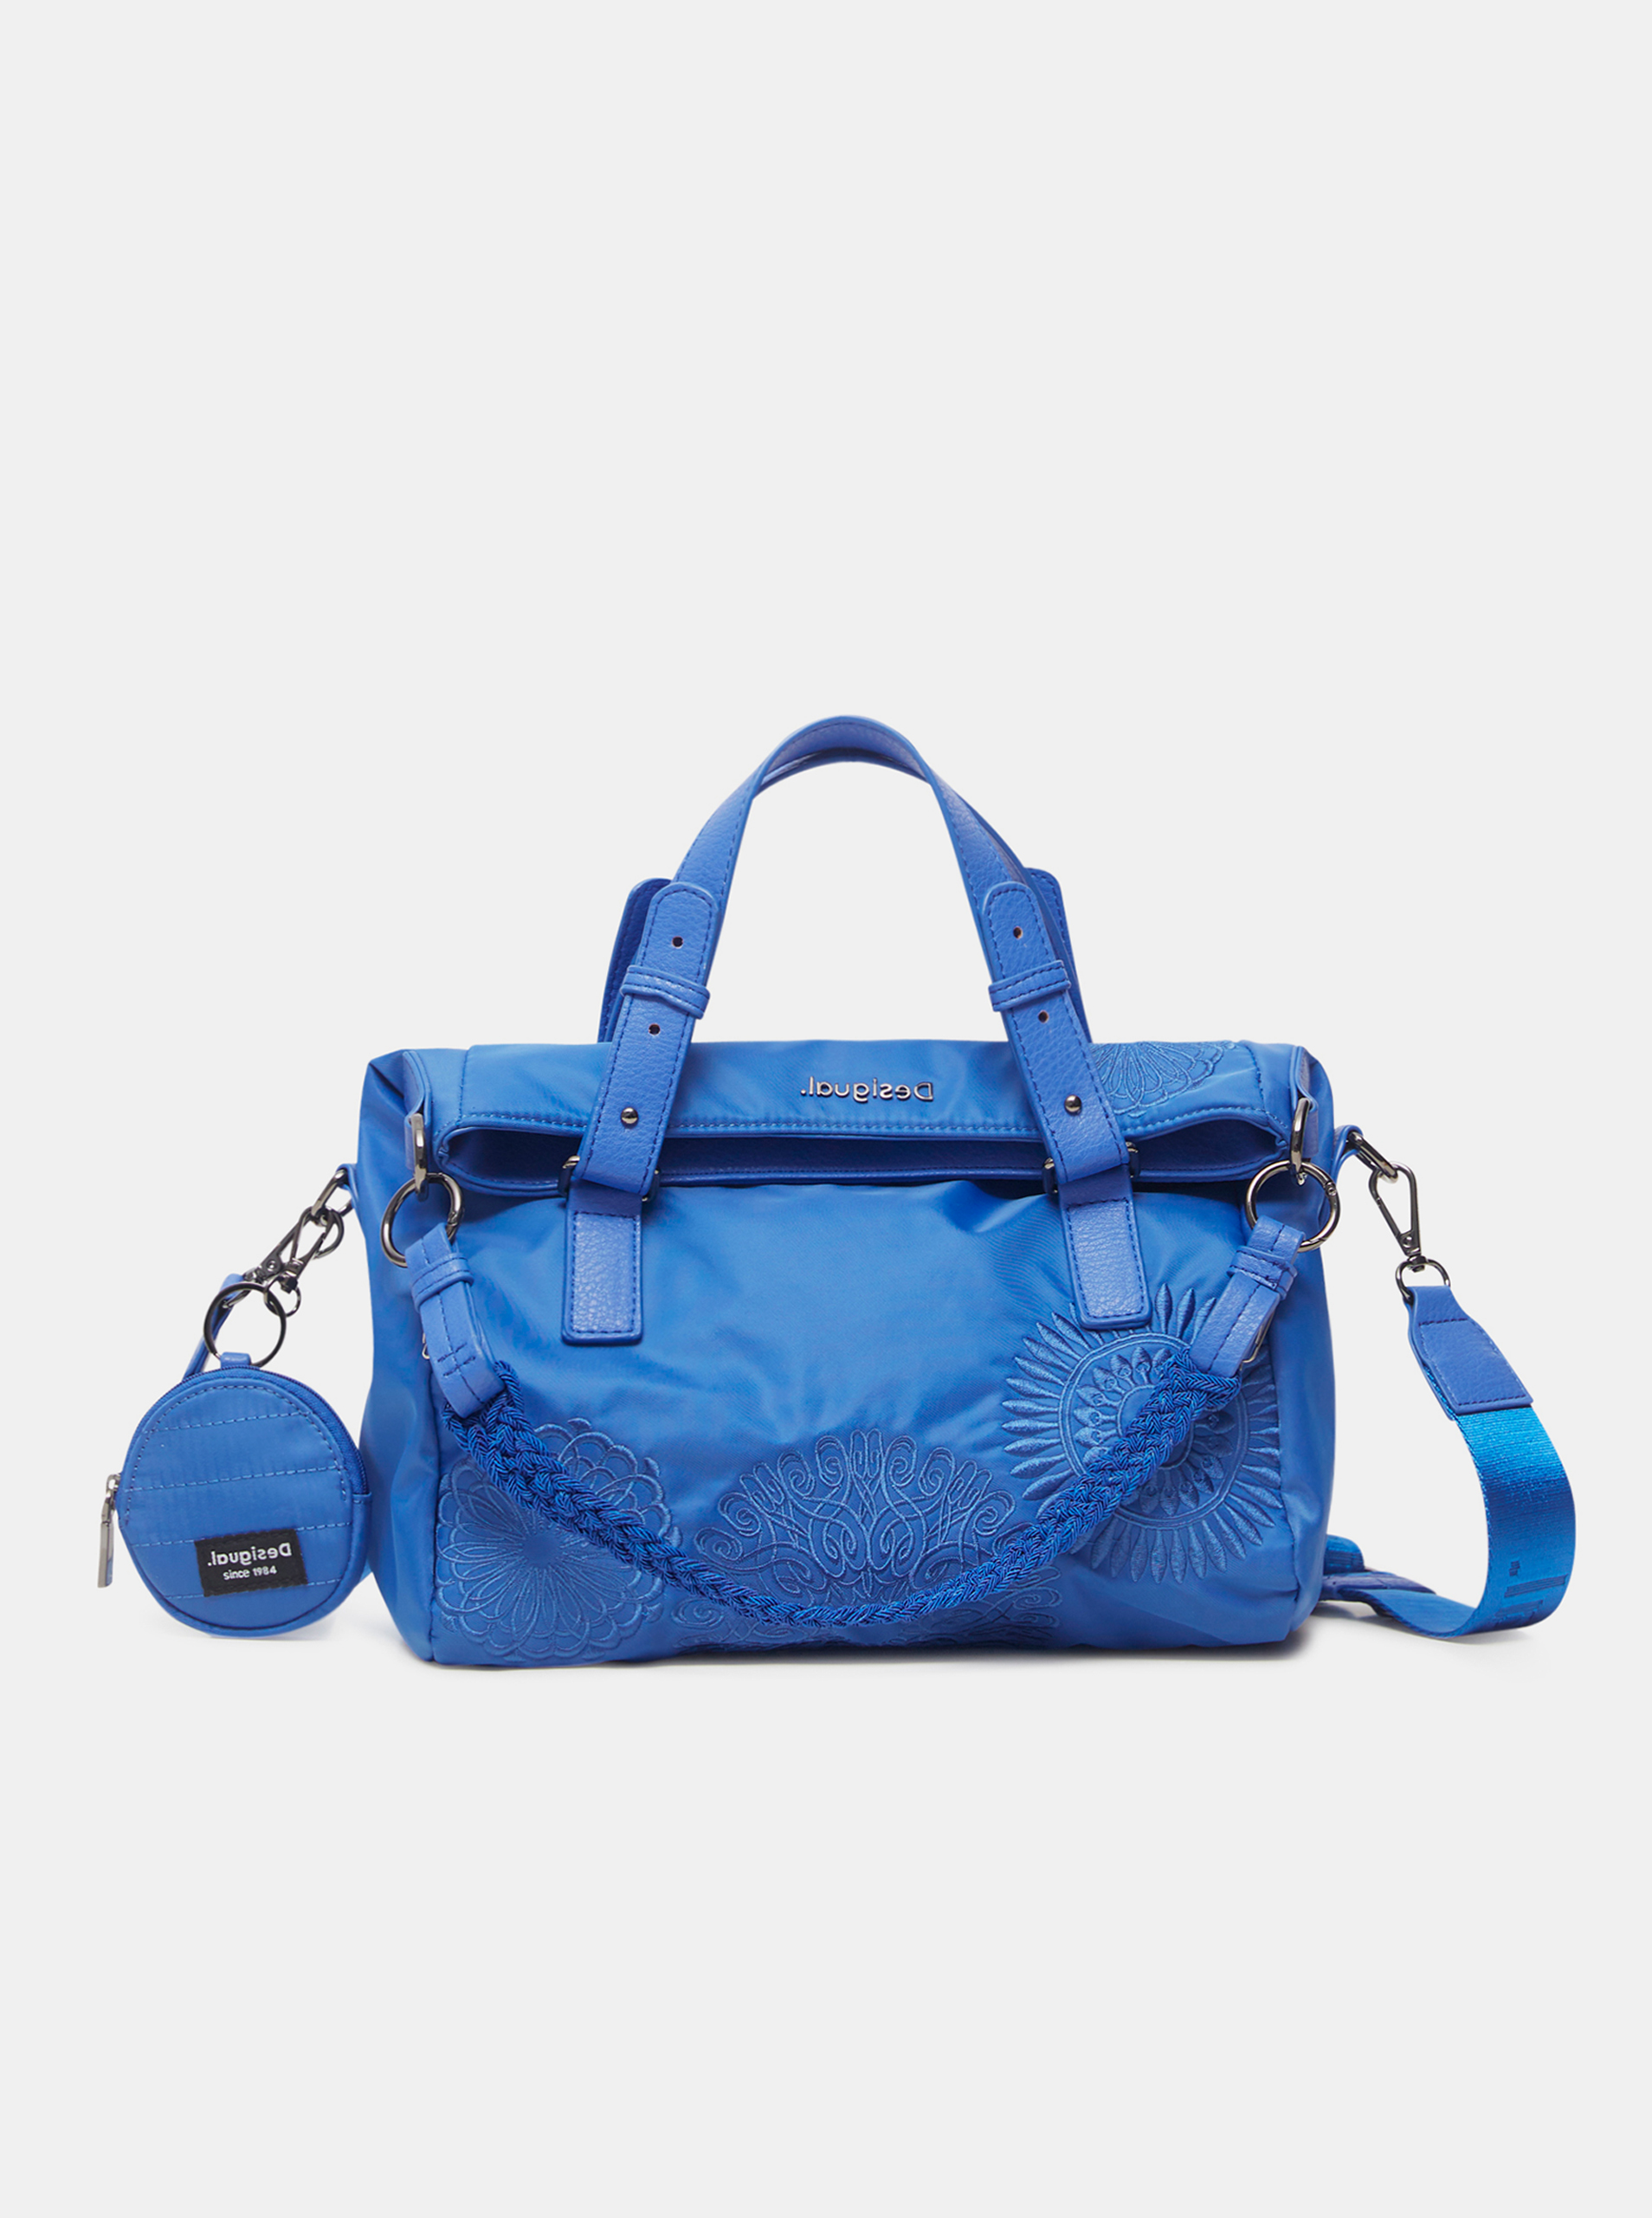 Desigual Women's bag blue  Mandrala